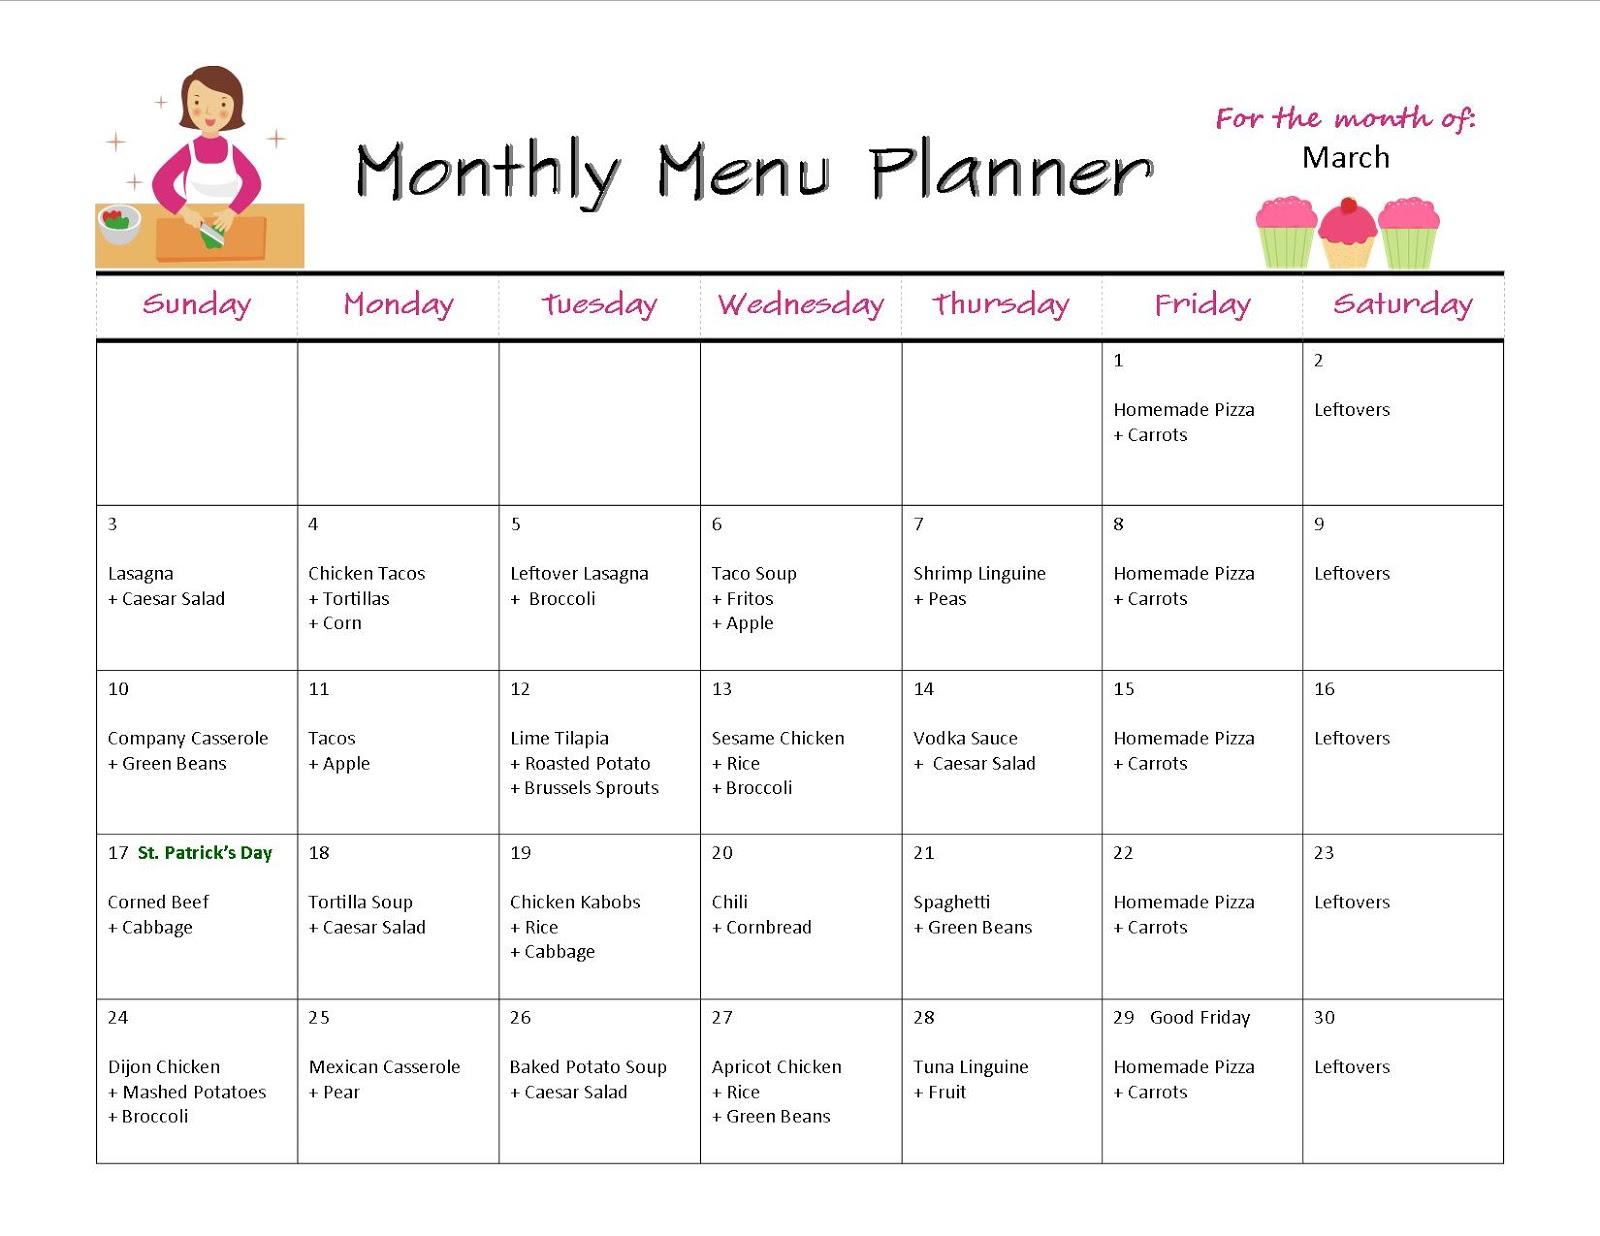 Weekly Calendar Menu Planner : Monthly menus images frompo